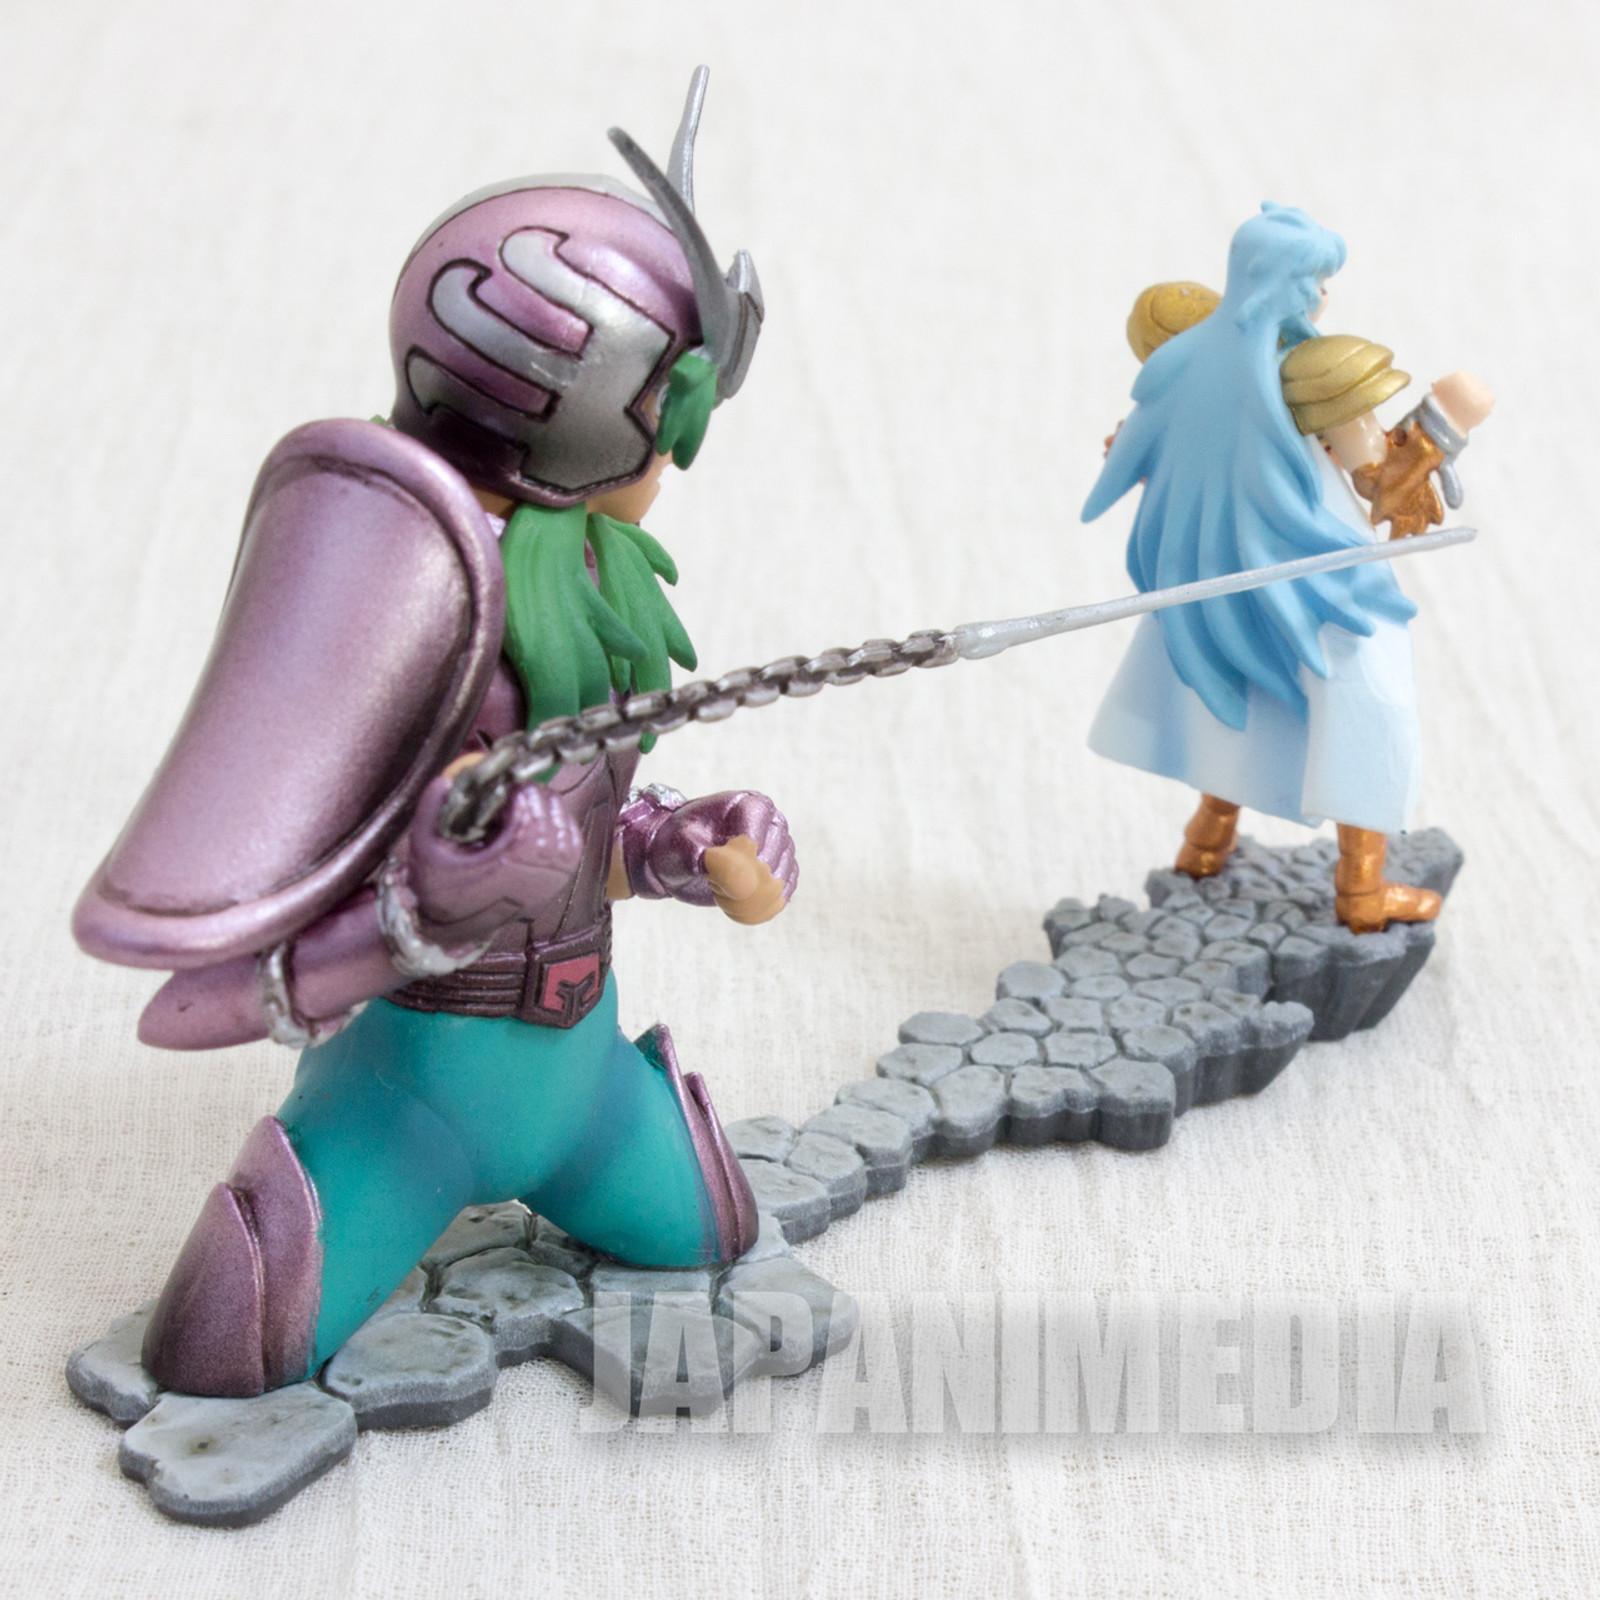 Saint Seiya Diorama Figure Andromeda Shun VS Pisces Aphrodite Megahouse JAPAN